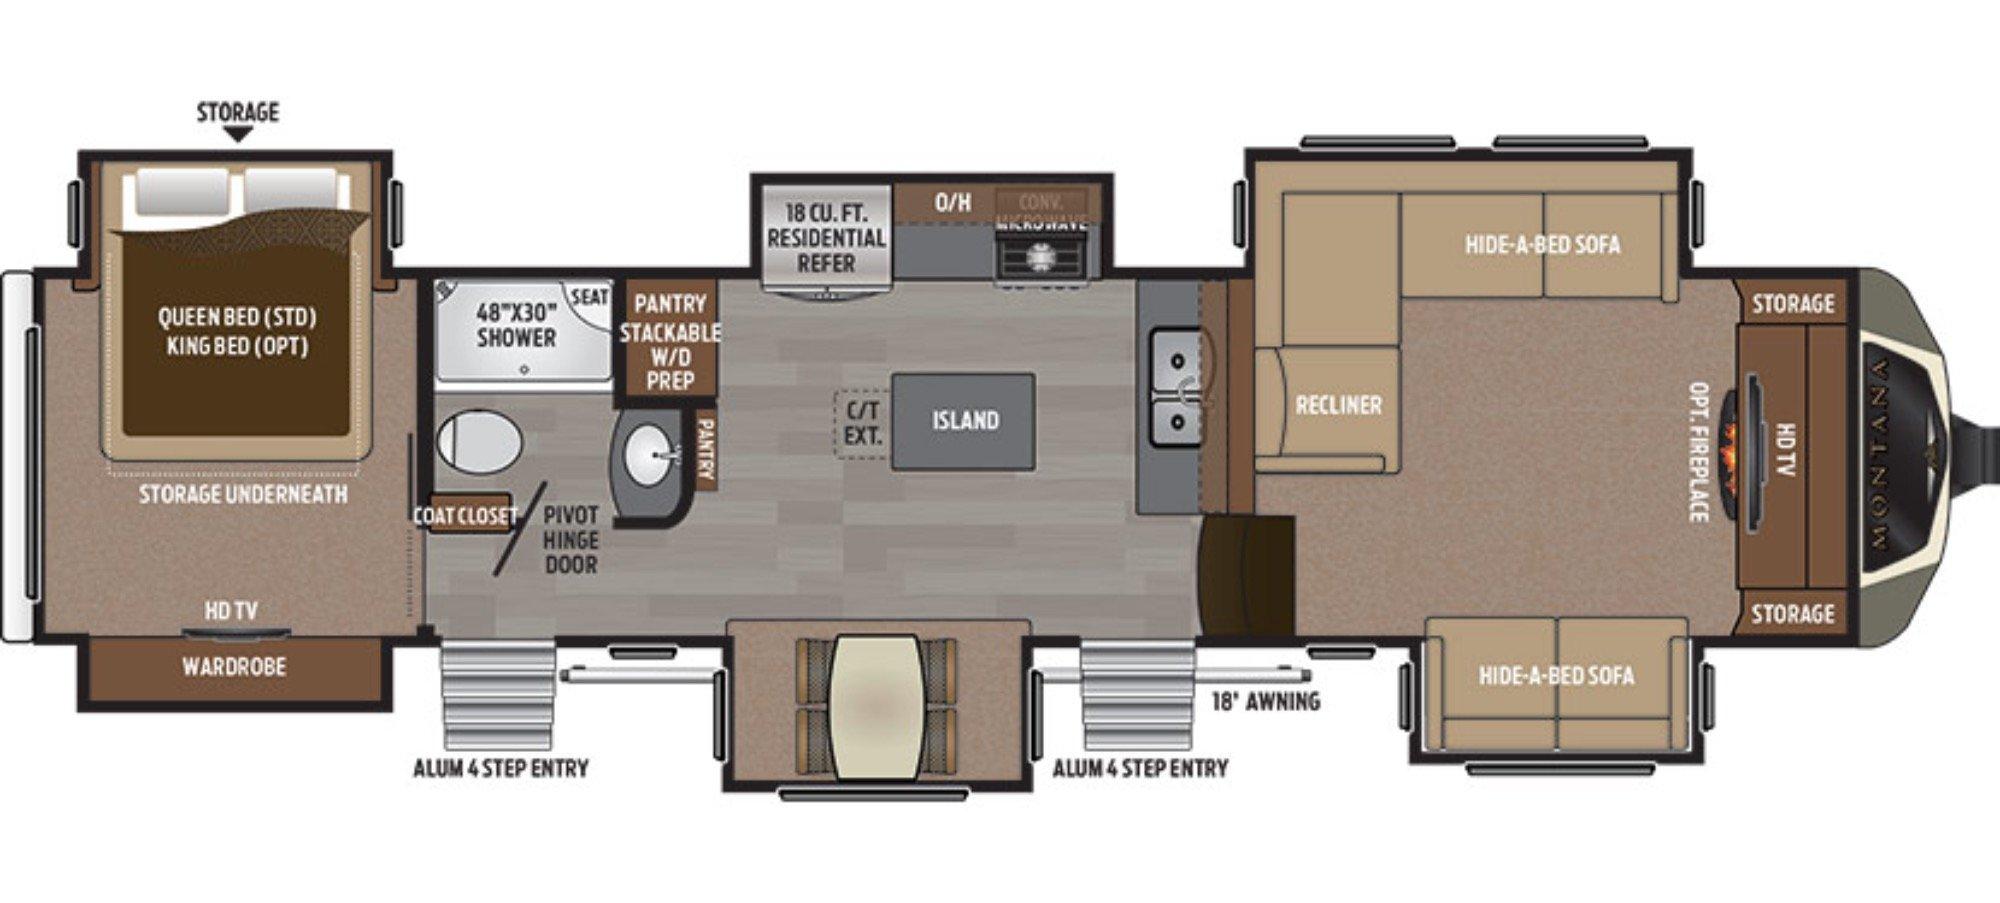 View Floor Plan for 2017 KEYSTONE MONTANA 3711FL